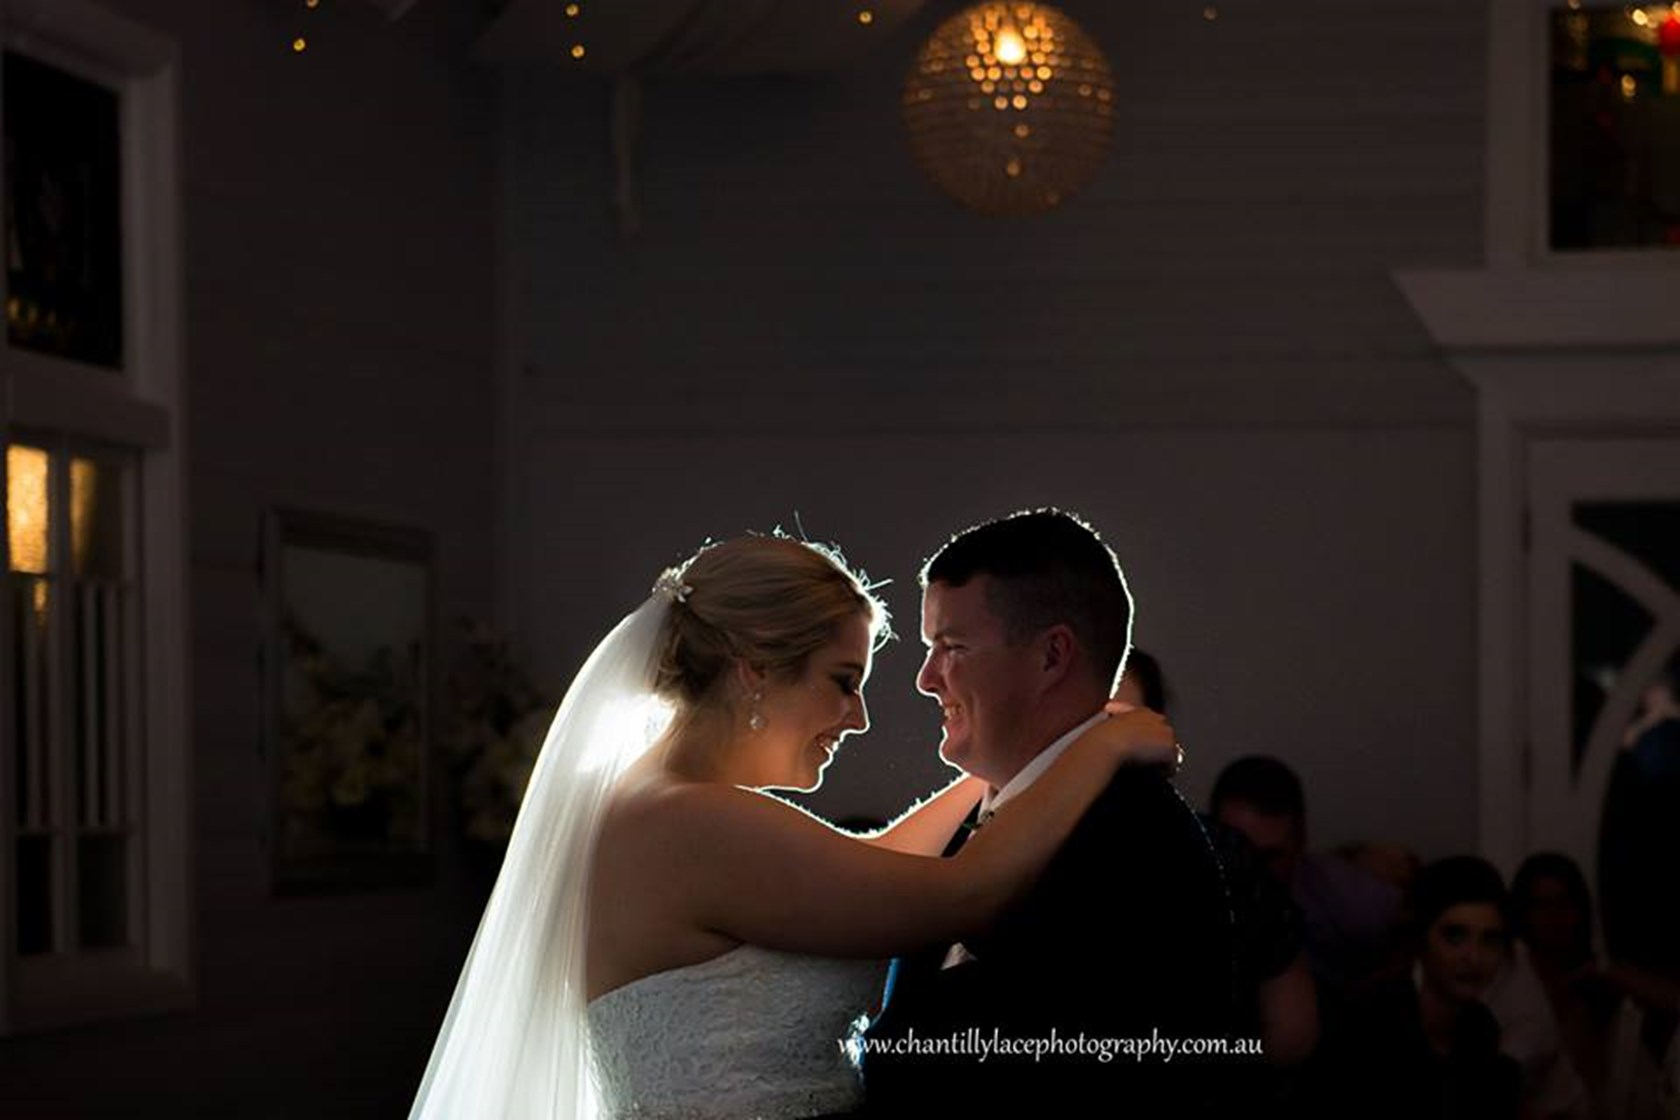 Wedding Venue - Darling St Chapel 14 on Veilability